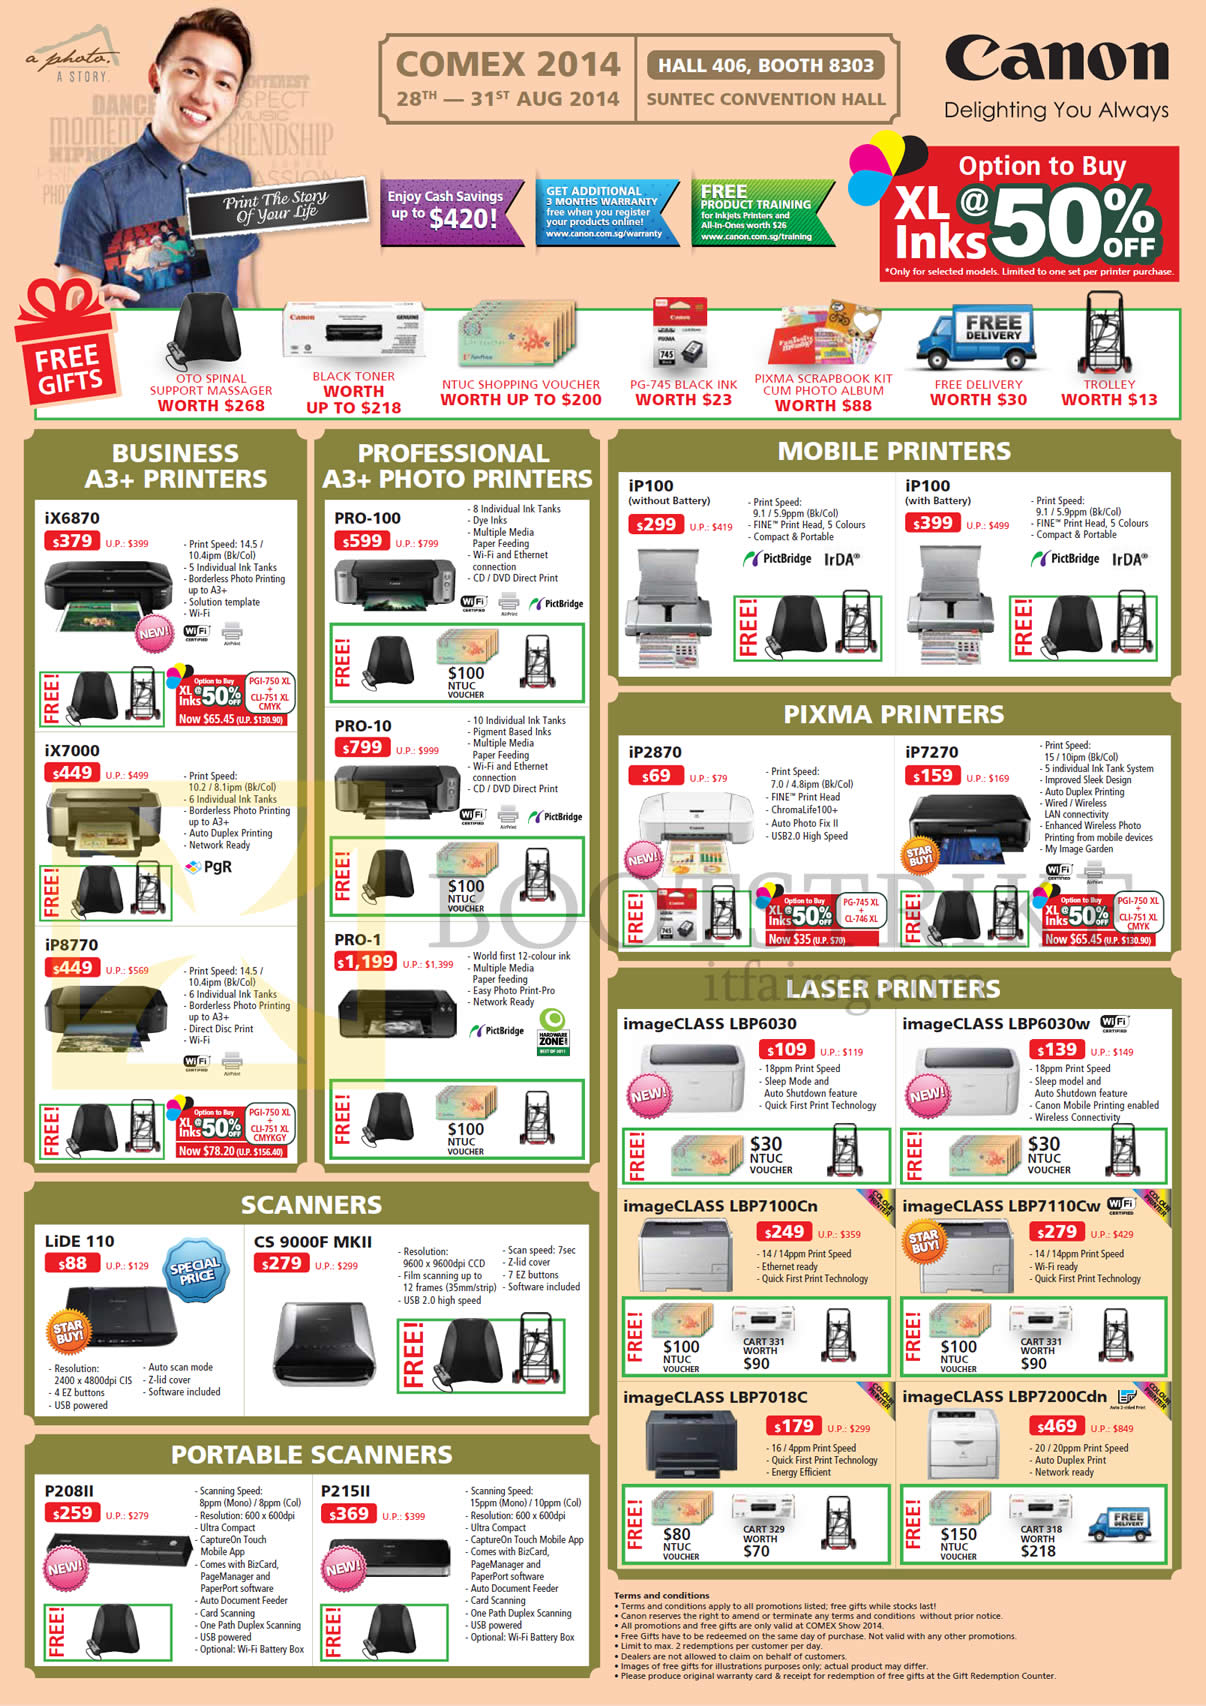 COMEX 2014 price list image brochure of Canon Printers, Scanners, Photo Printers, Laser, Mobile, Pixma, IX6870, IX7000, Pro-100, Pro-10, Pro-1, Lide 110, CS9000F MK II, P215II, IP100, IP2870, IP7270